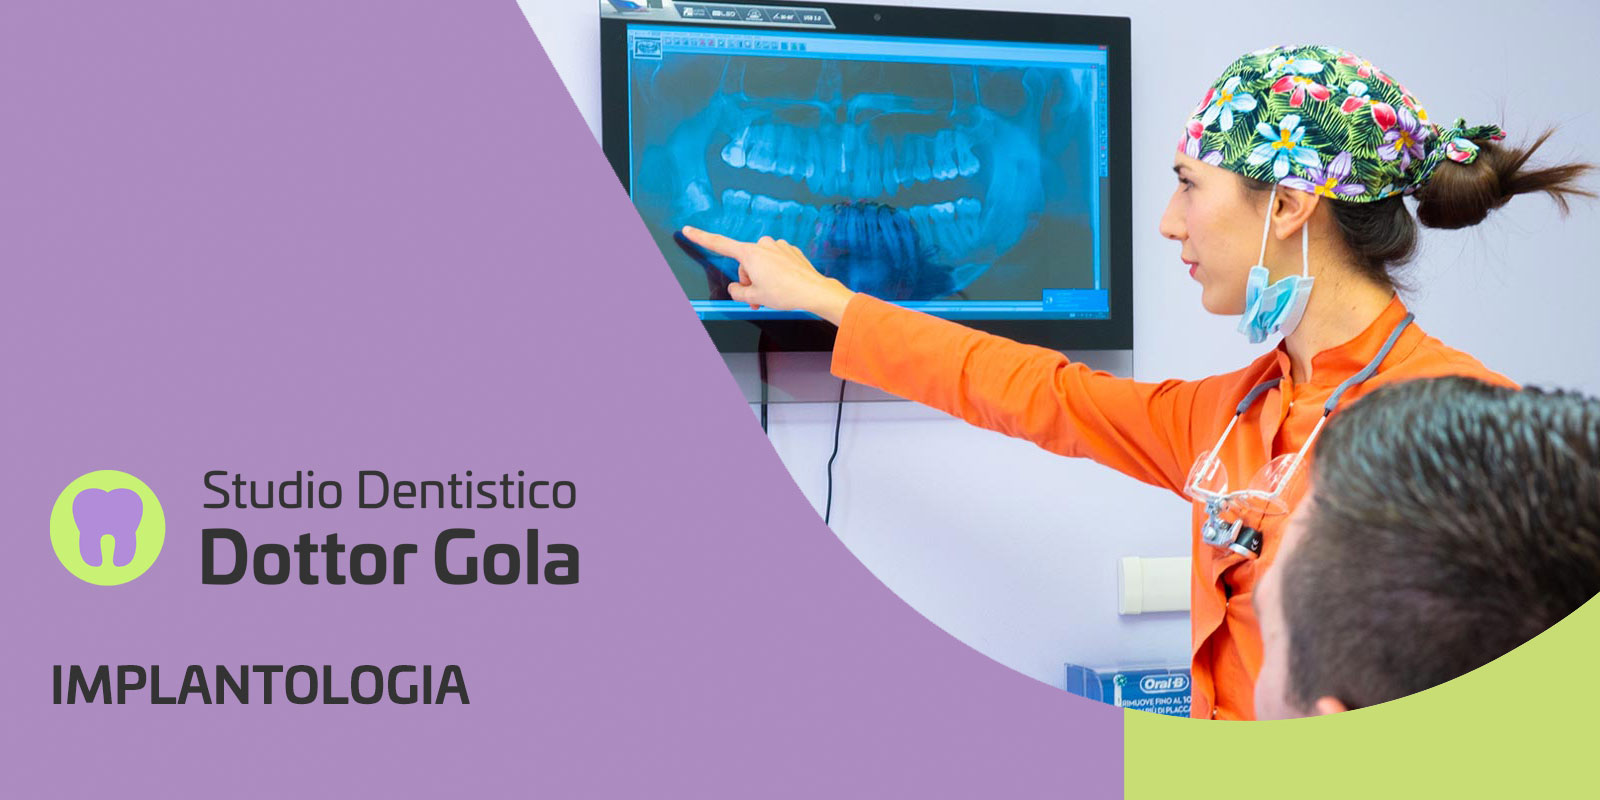 implantologia-dentista-gola-casteggio-pavia